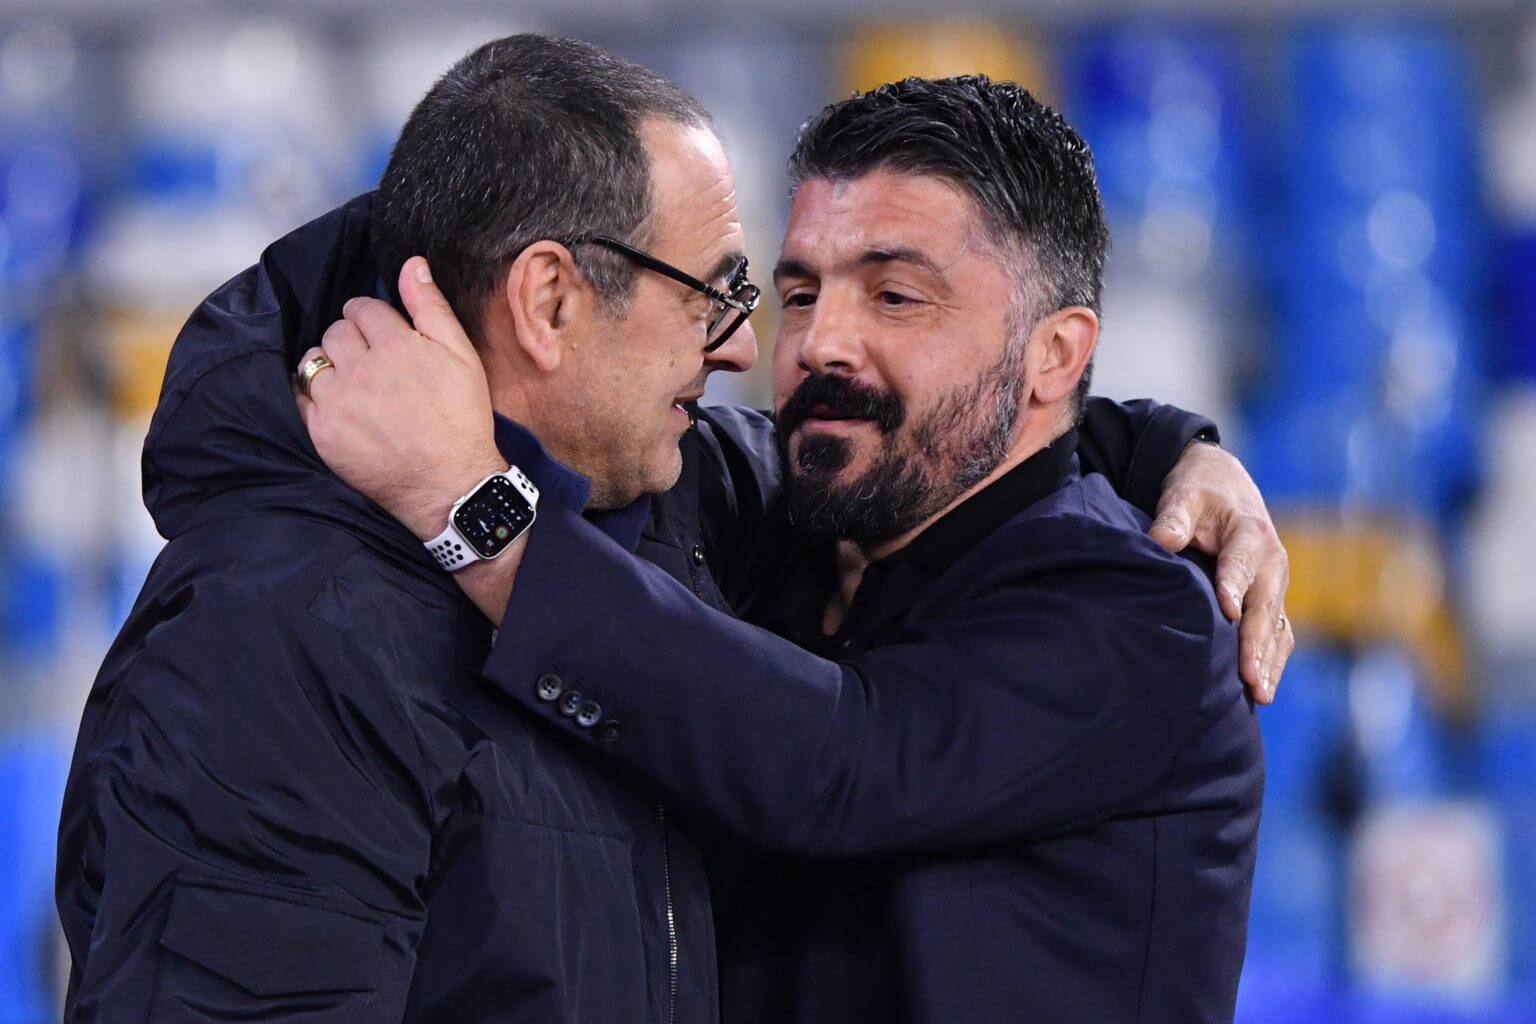 Coppa Italia Finale findet in Rom statt.